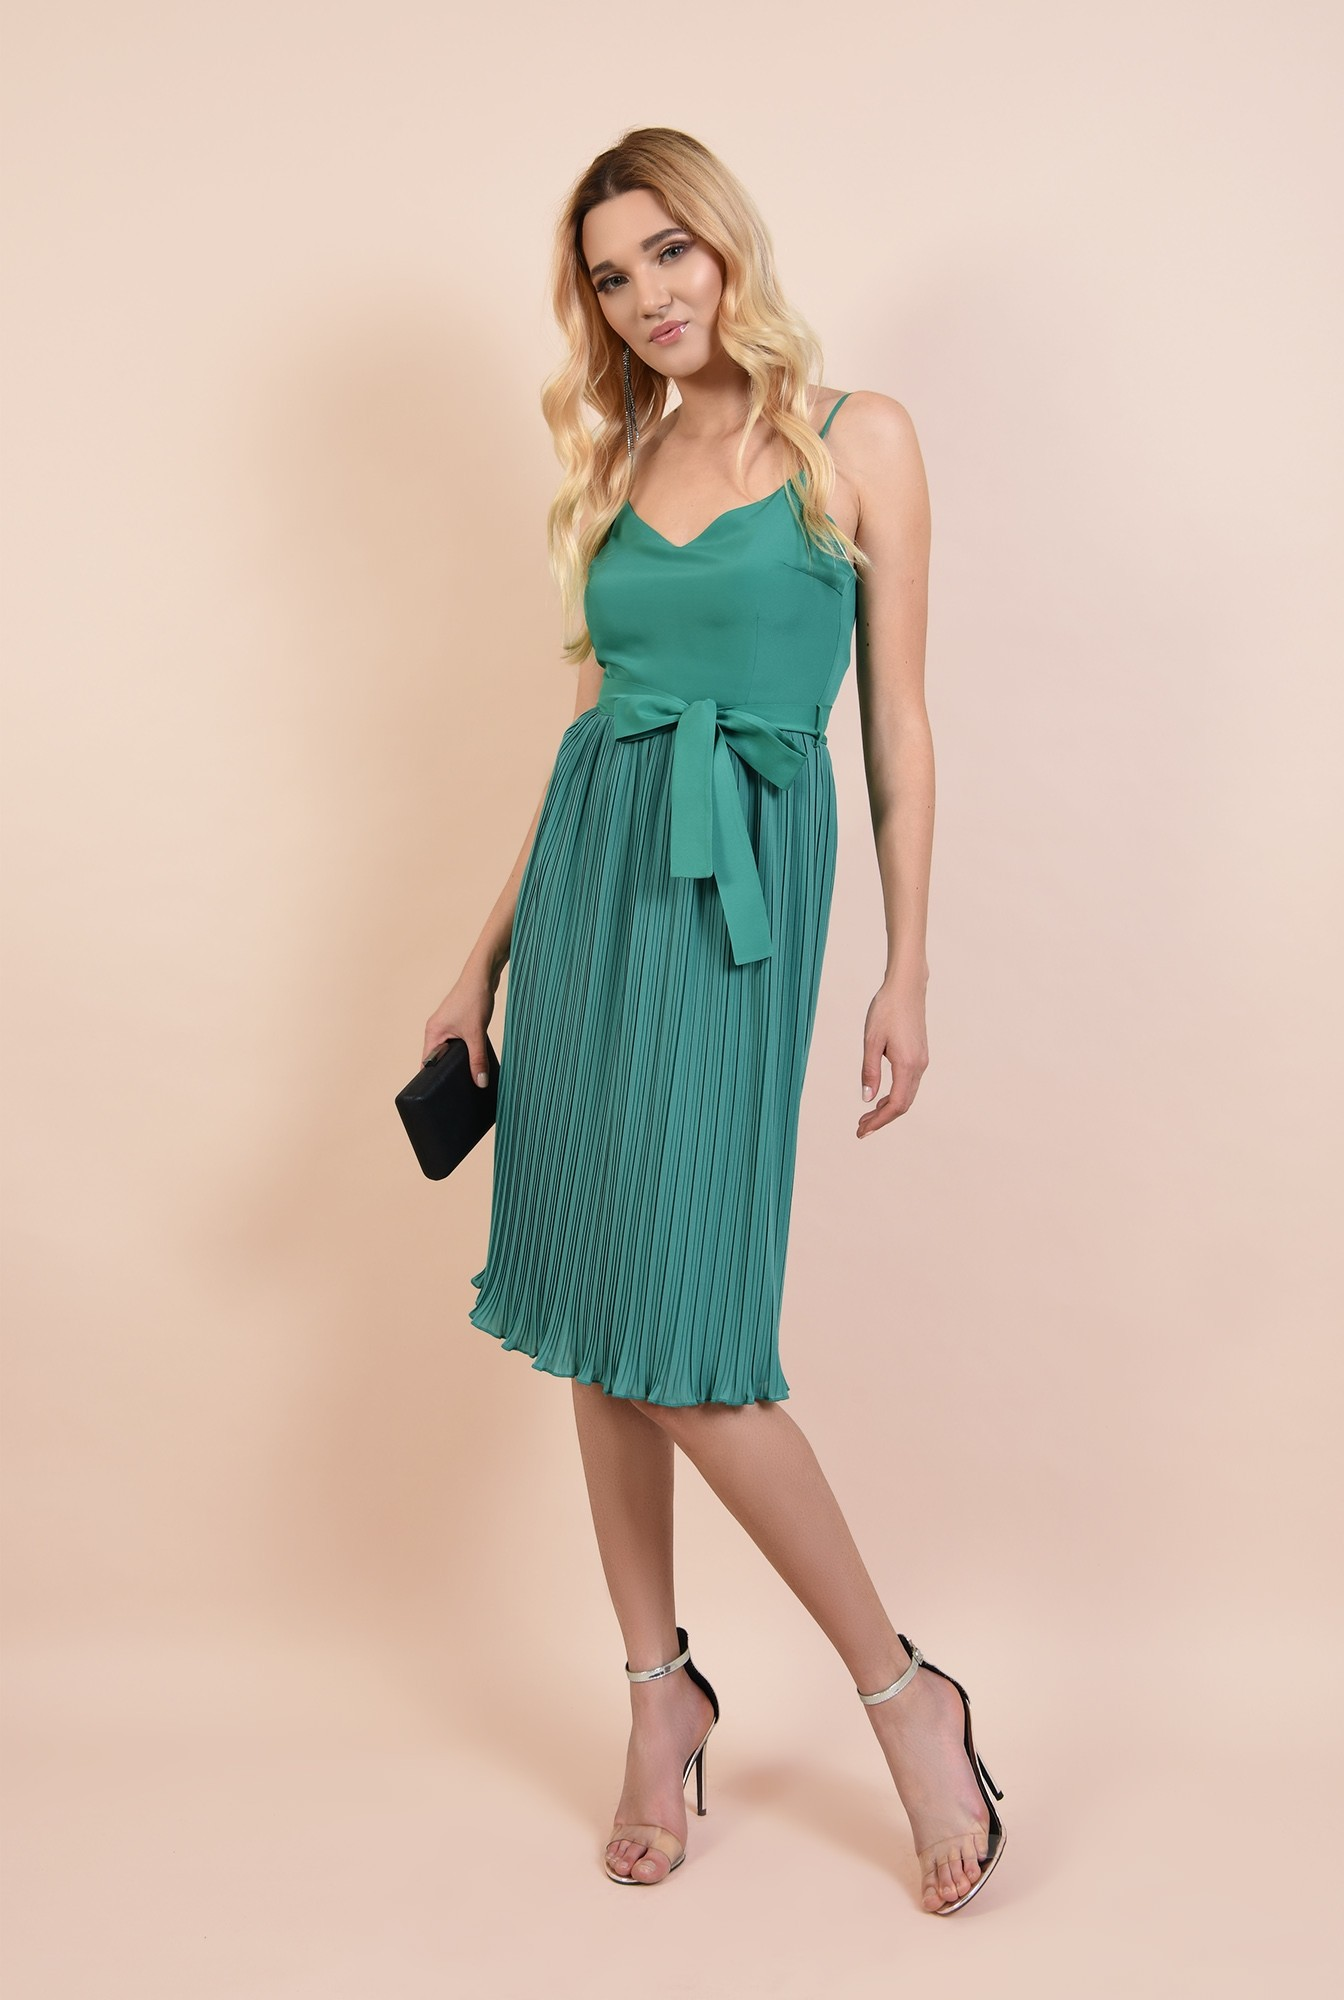 3 - rochie eleganta, midi, din voal plise, cu cordon, verde turcoaz